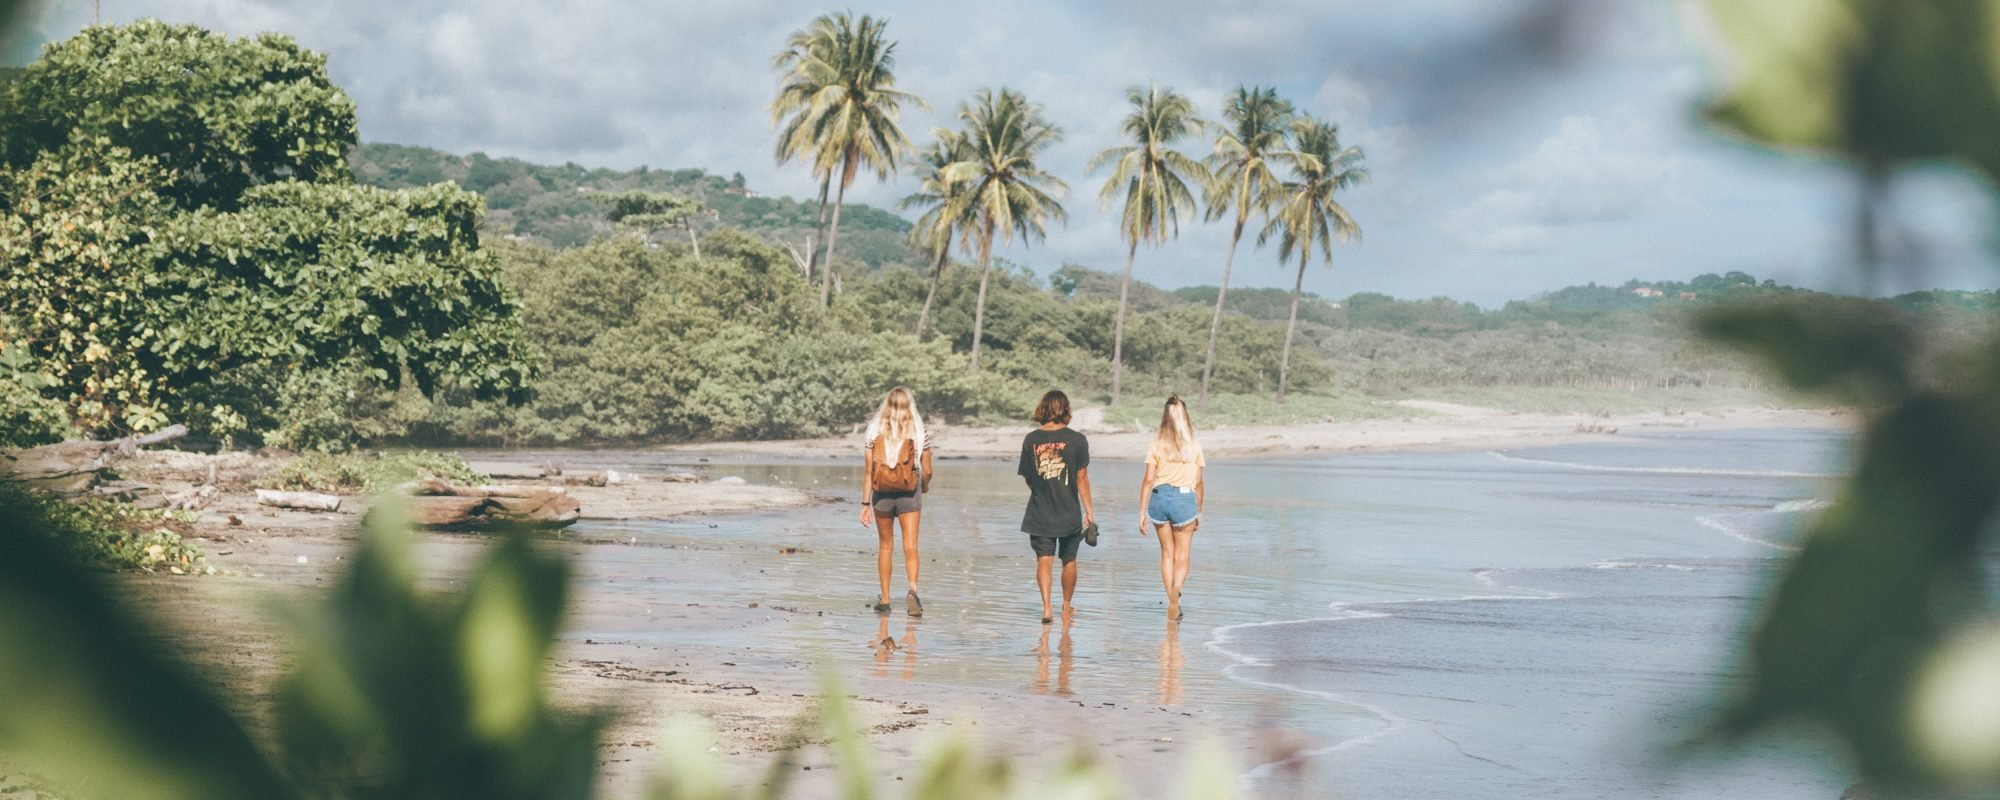 Walk On Guiones Beach